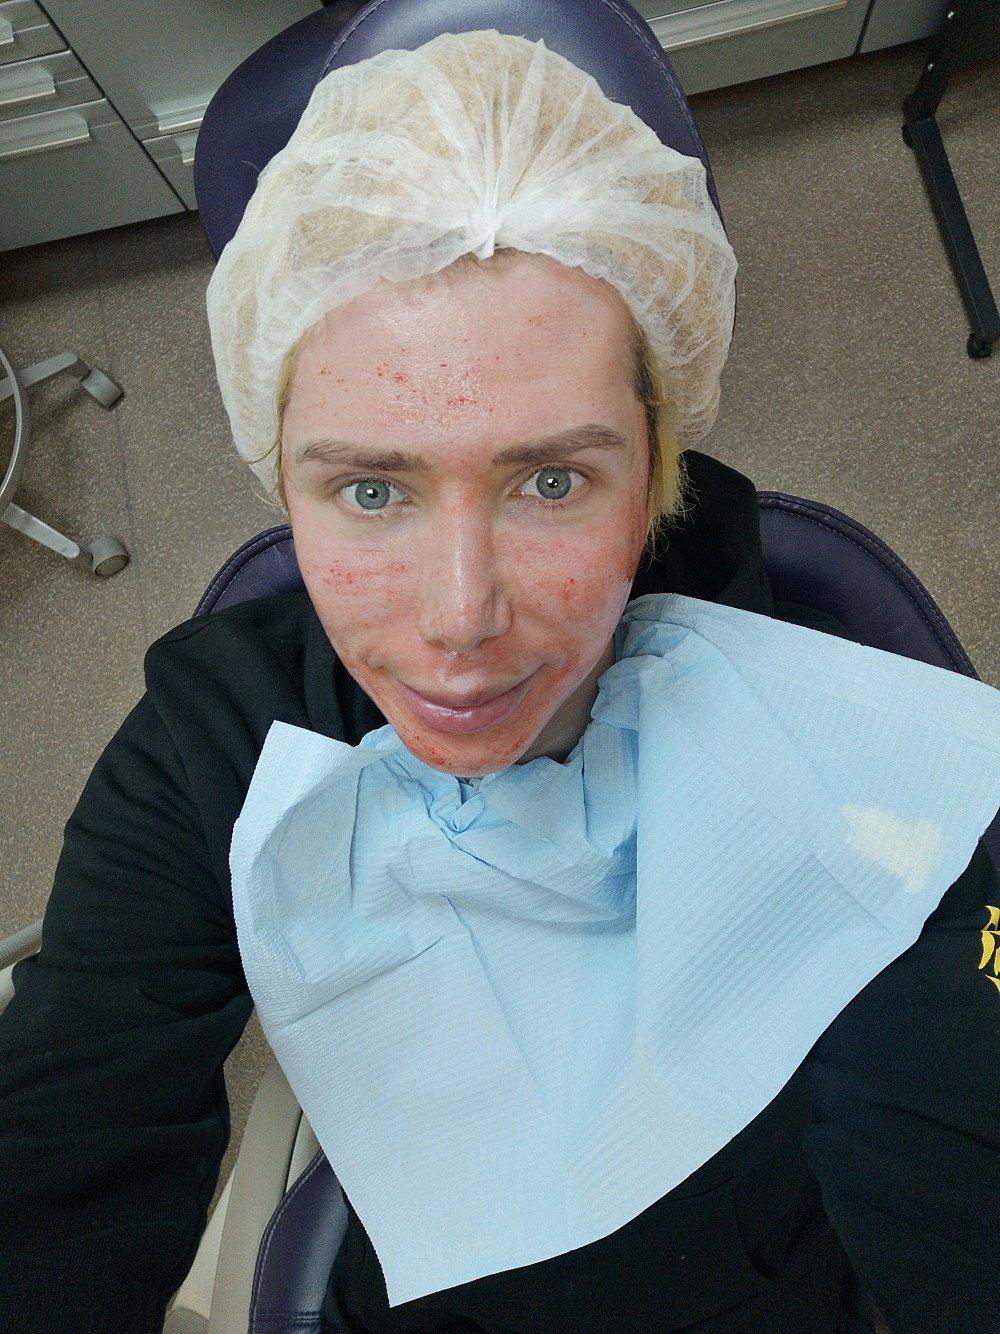 Oli London undergos Skin Whitening Injections to Match Jimins Skin   allkpop